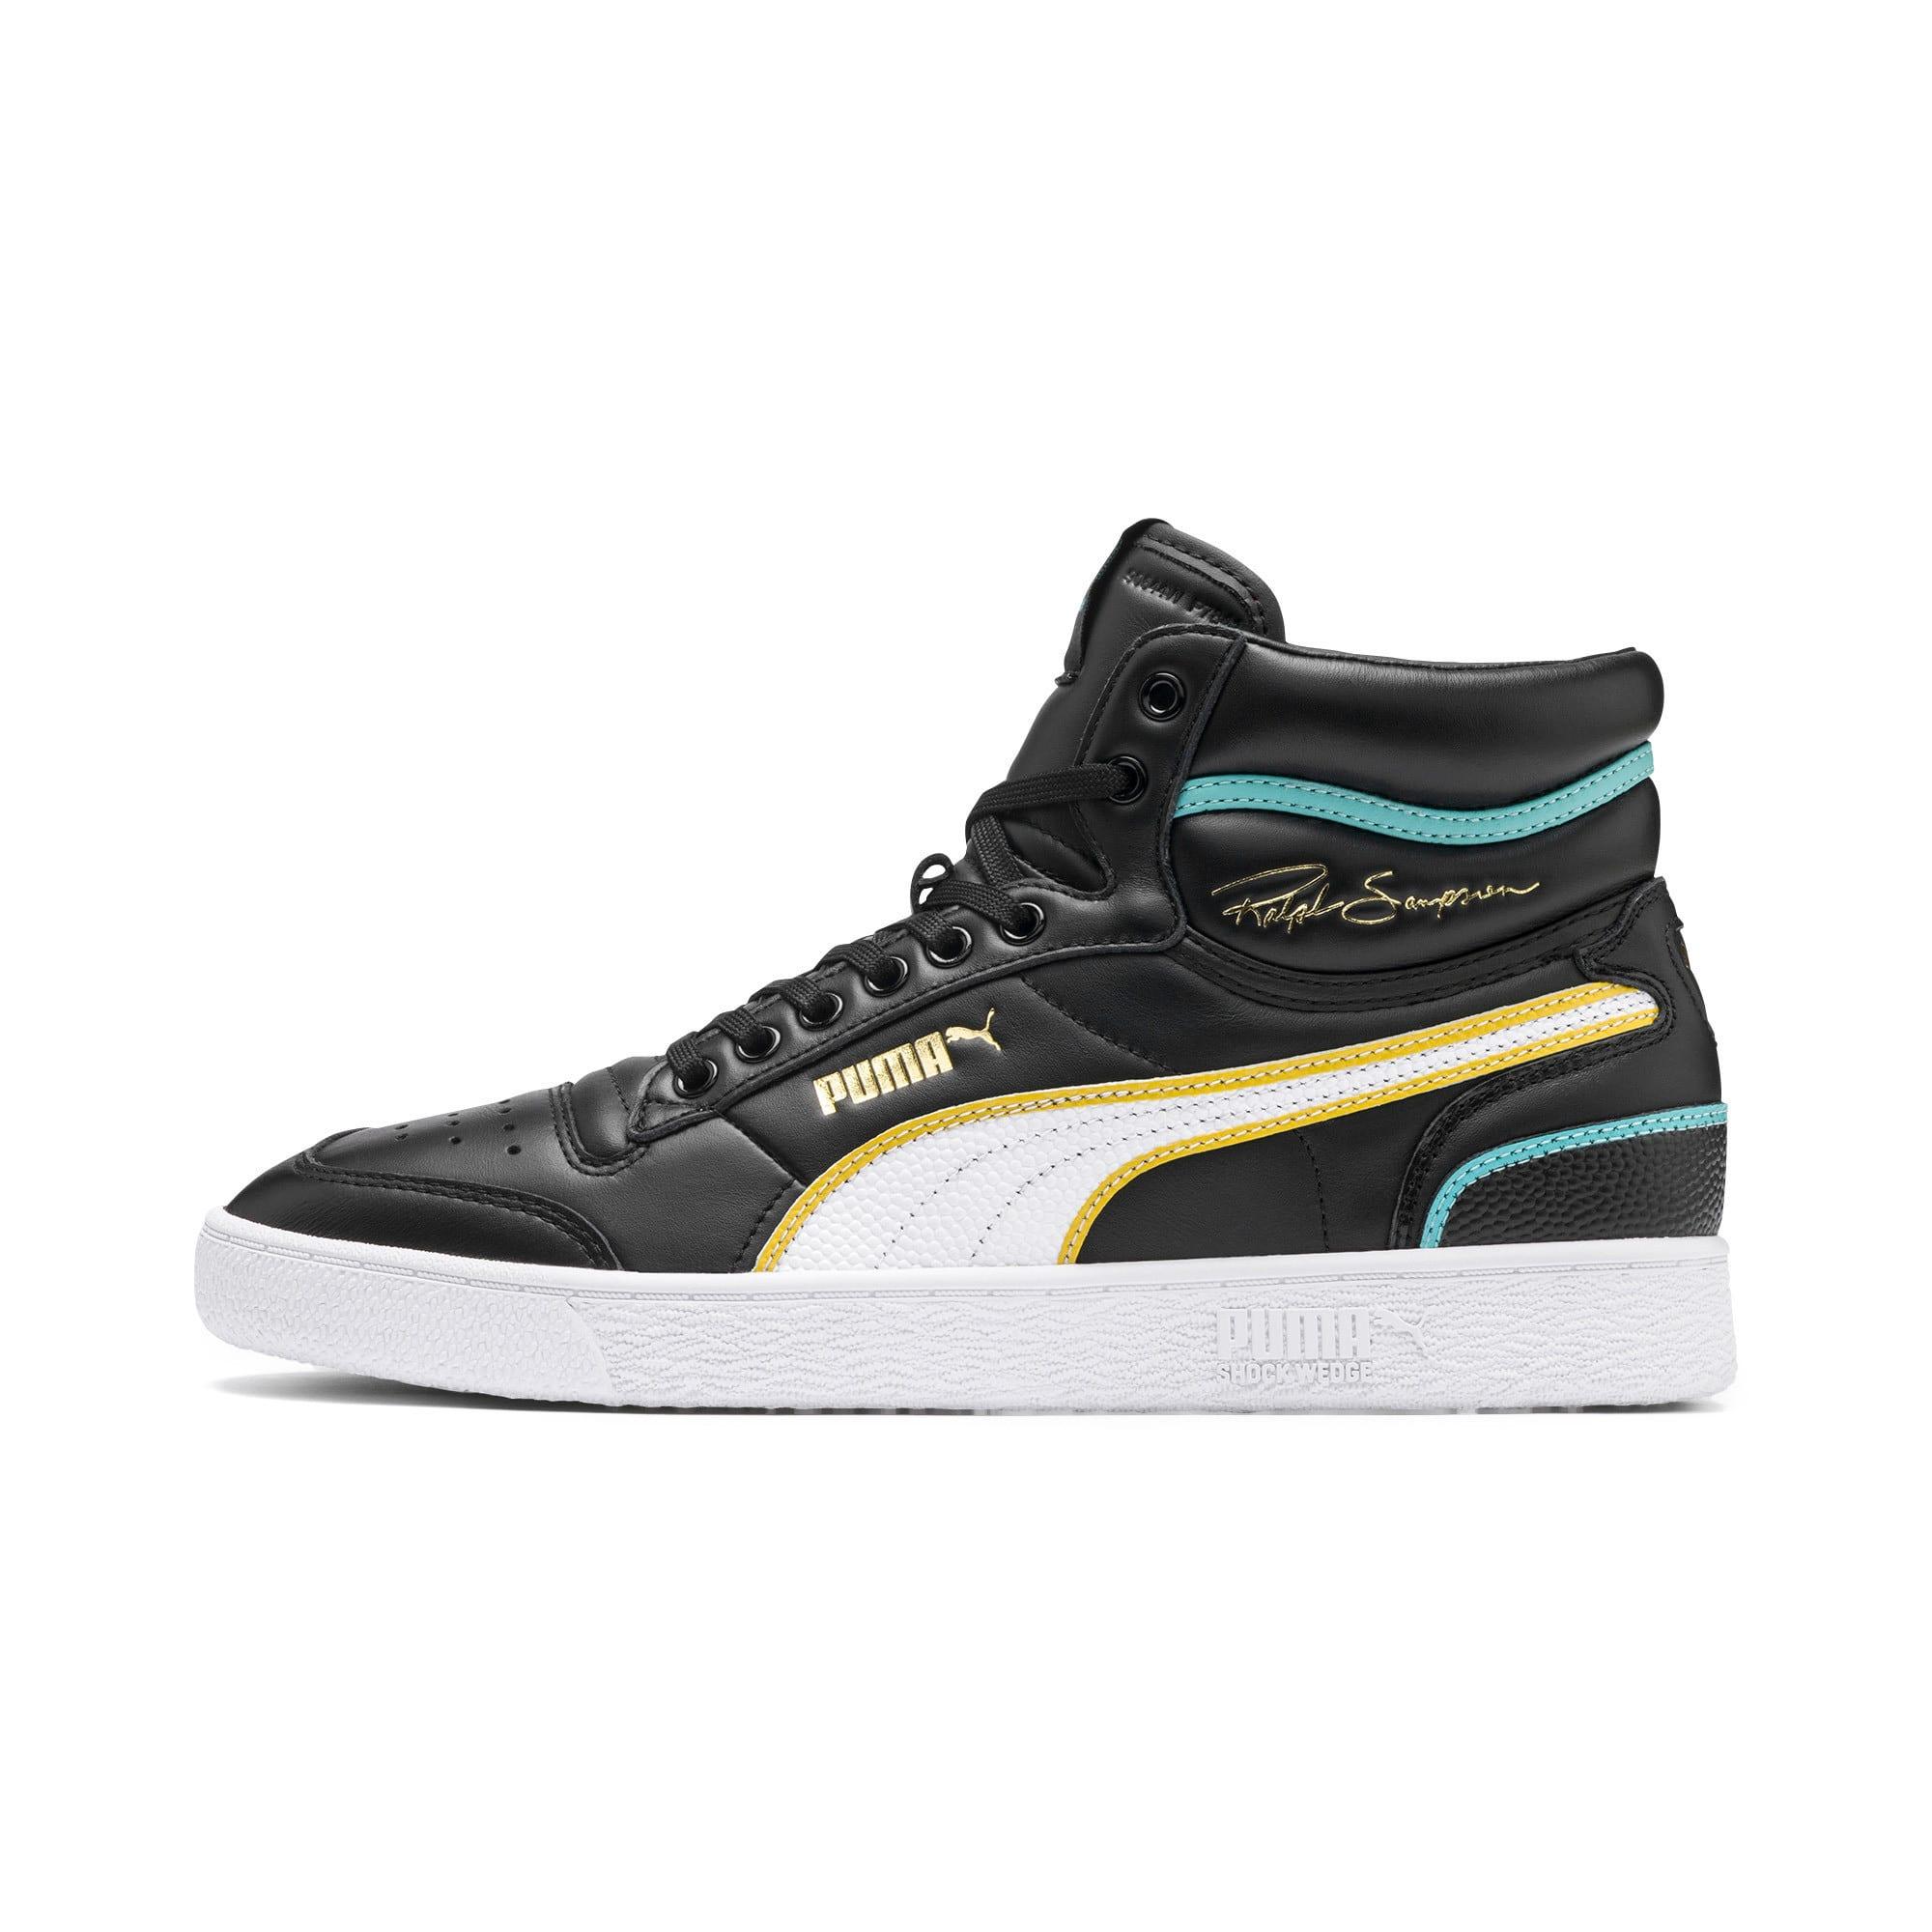 Thumbnail 1 of Ralph Sampson Mid Hoops Sneakers, Puma Blk-Puma Wht-Puma Wht, medium